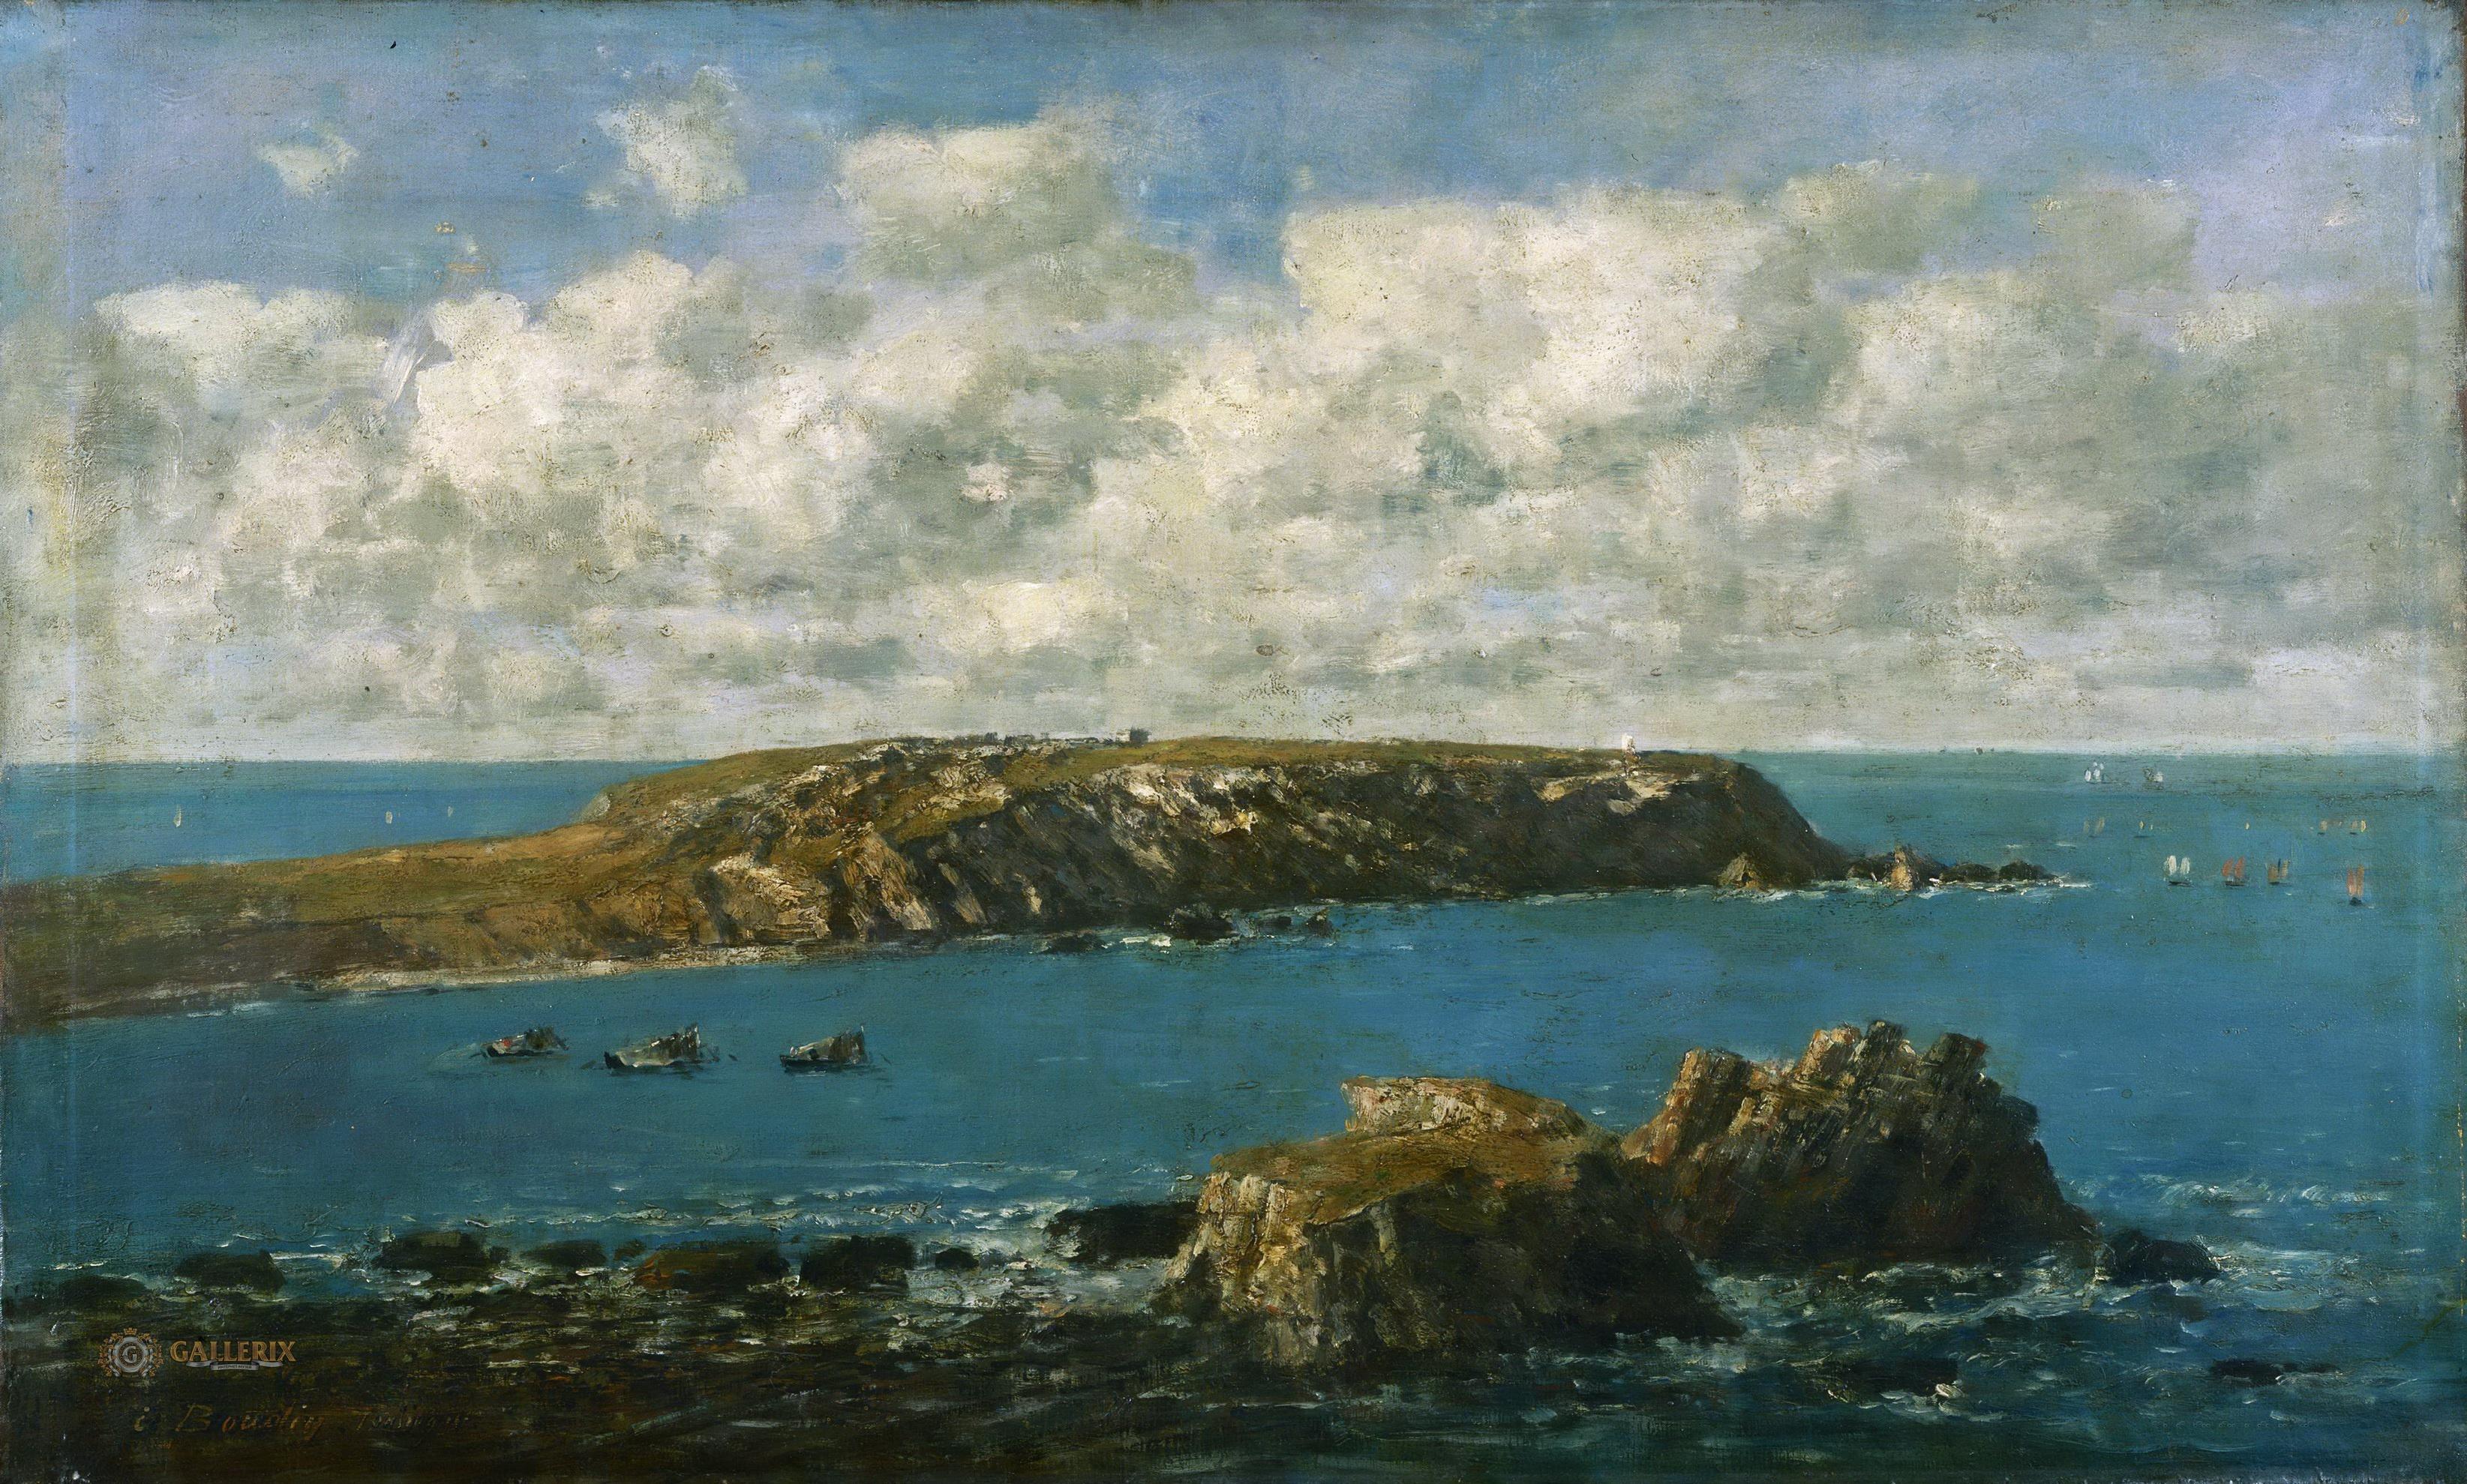 boudin картина camaret-sur-mer камаре-сюр-мер столица лангустов Бретань пейзажи природы Альберт Сафиуллин